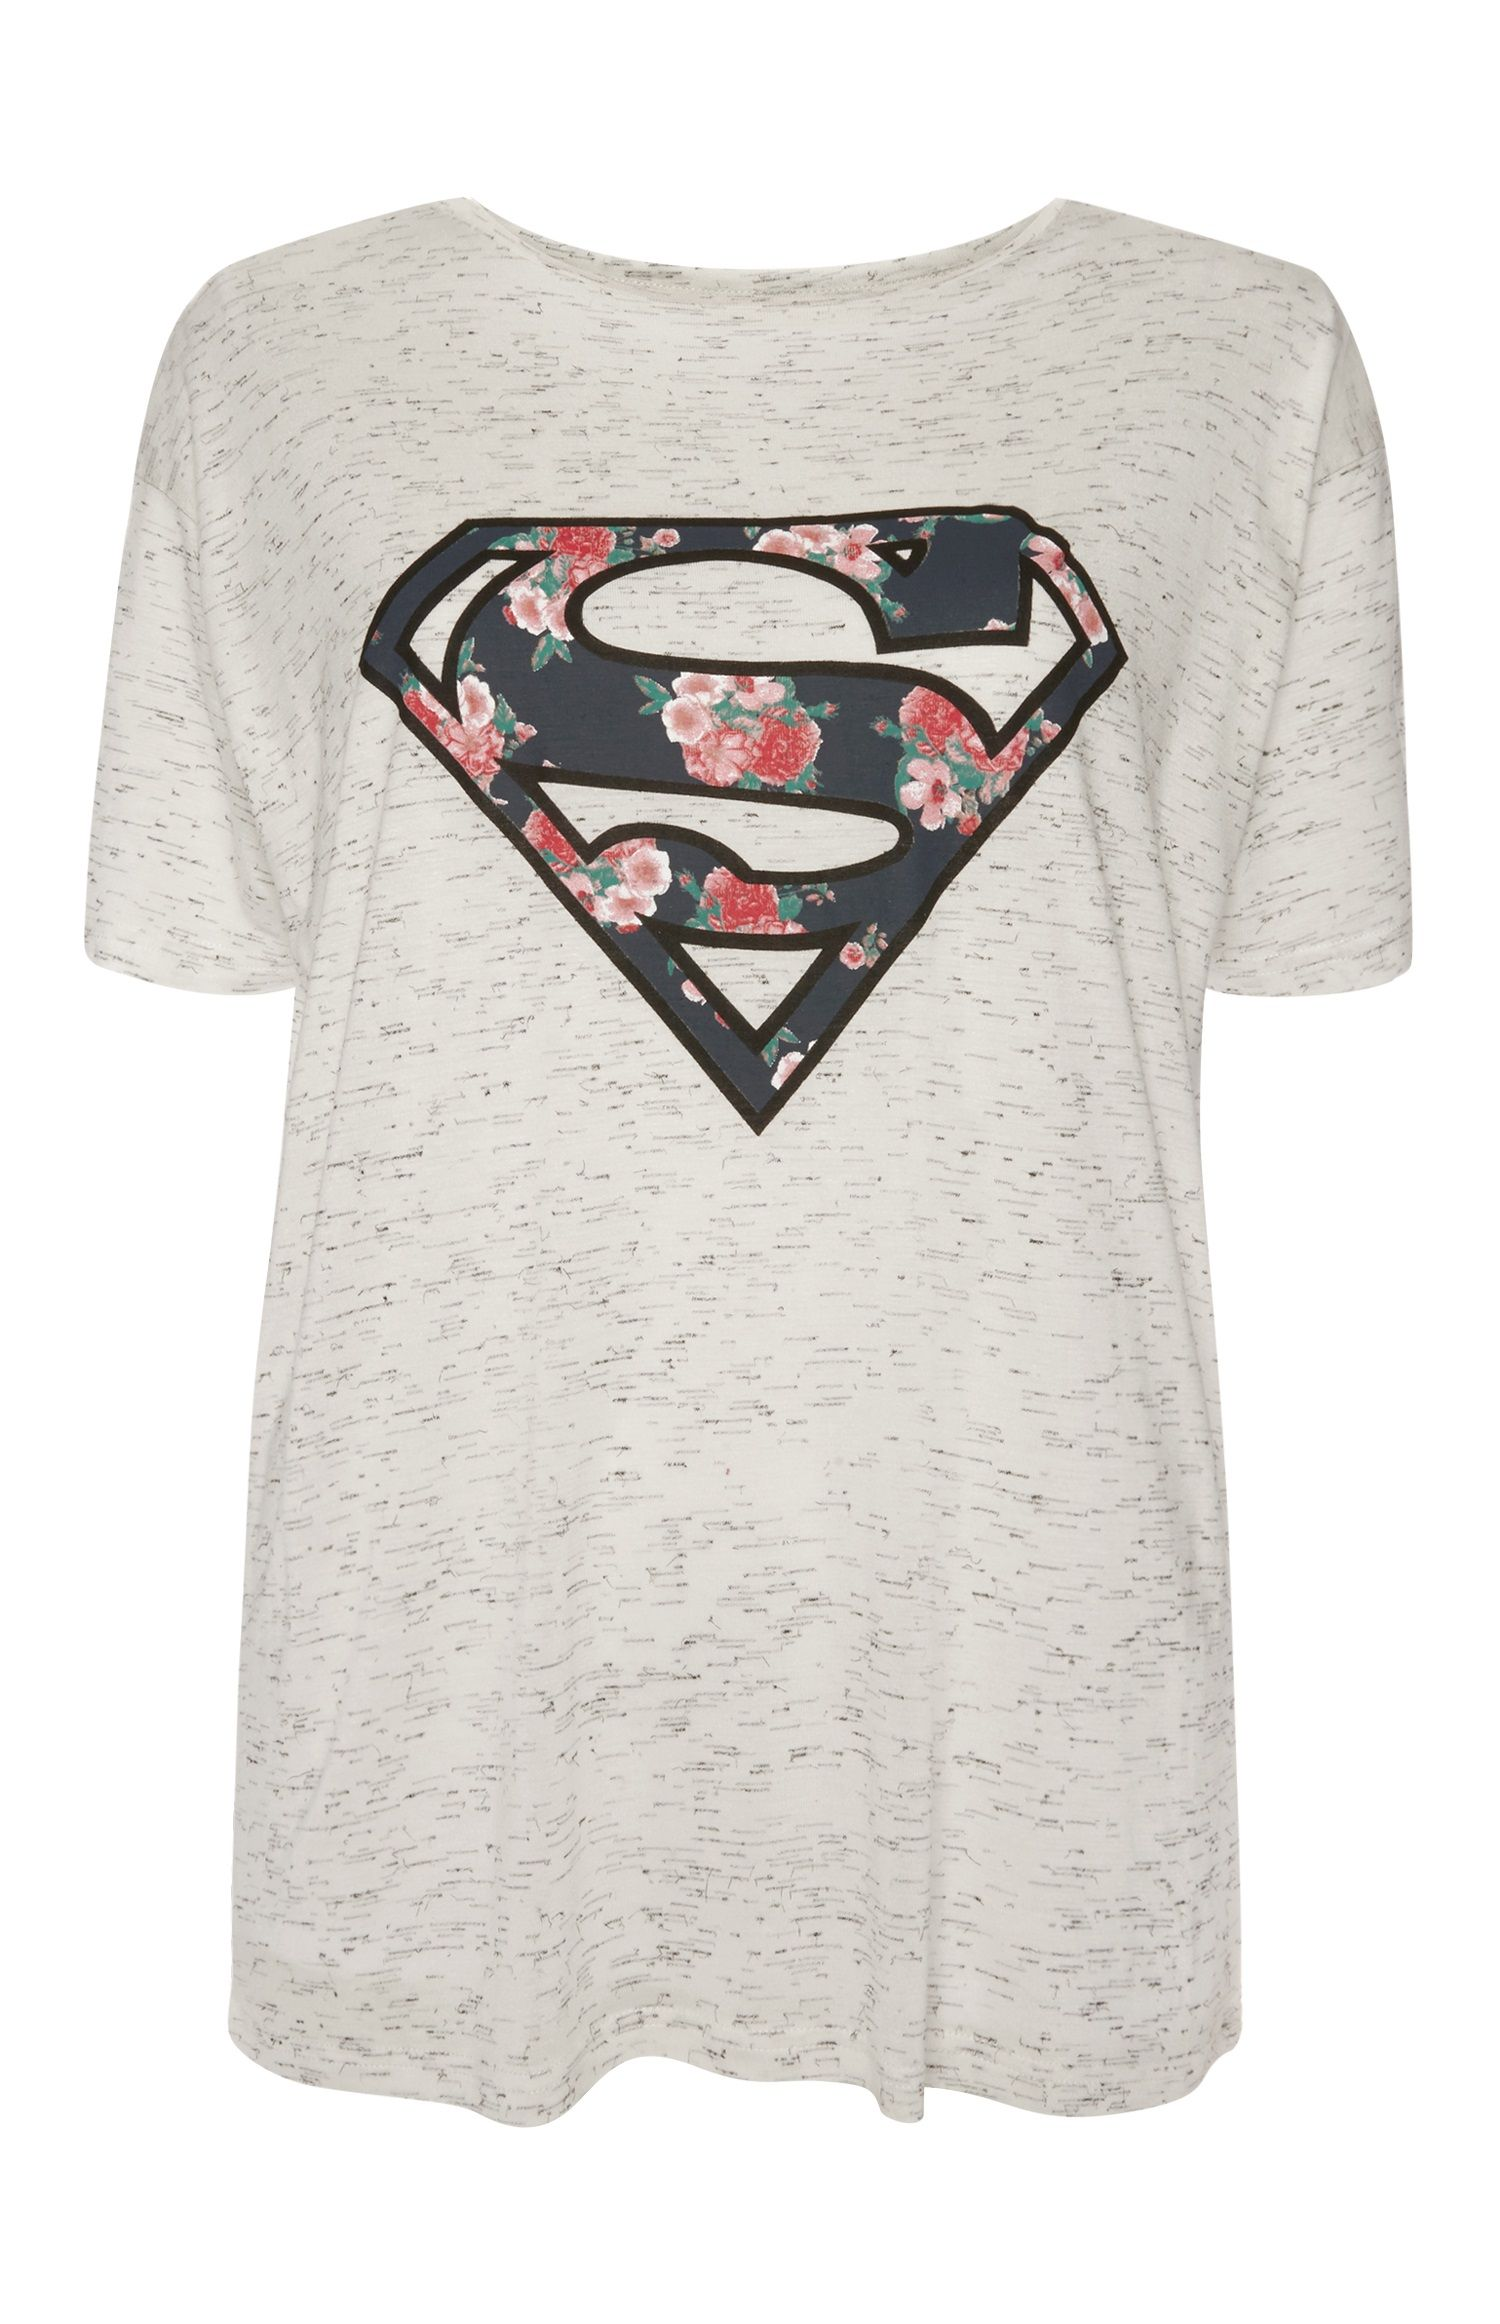 7ced08568c684 Primark - Grey Floral Superman T-Shirt | Superman! in 2019 ...